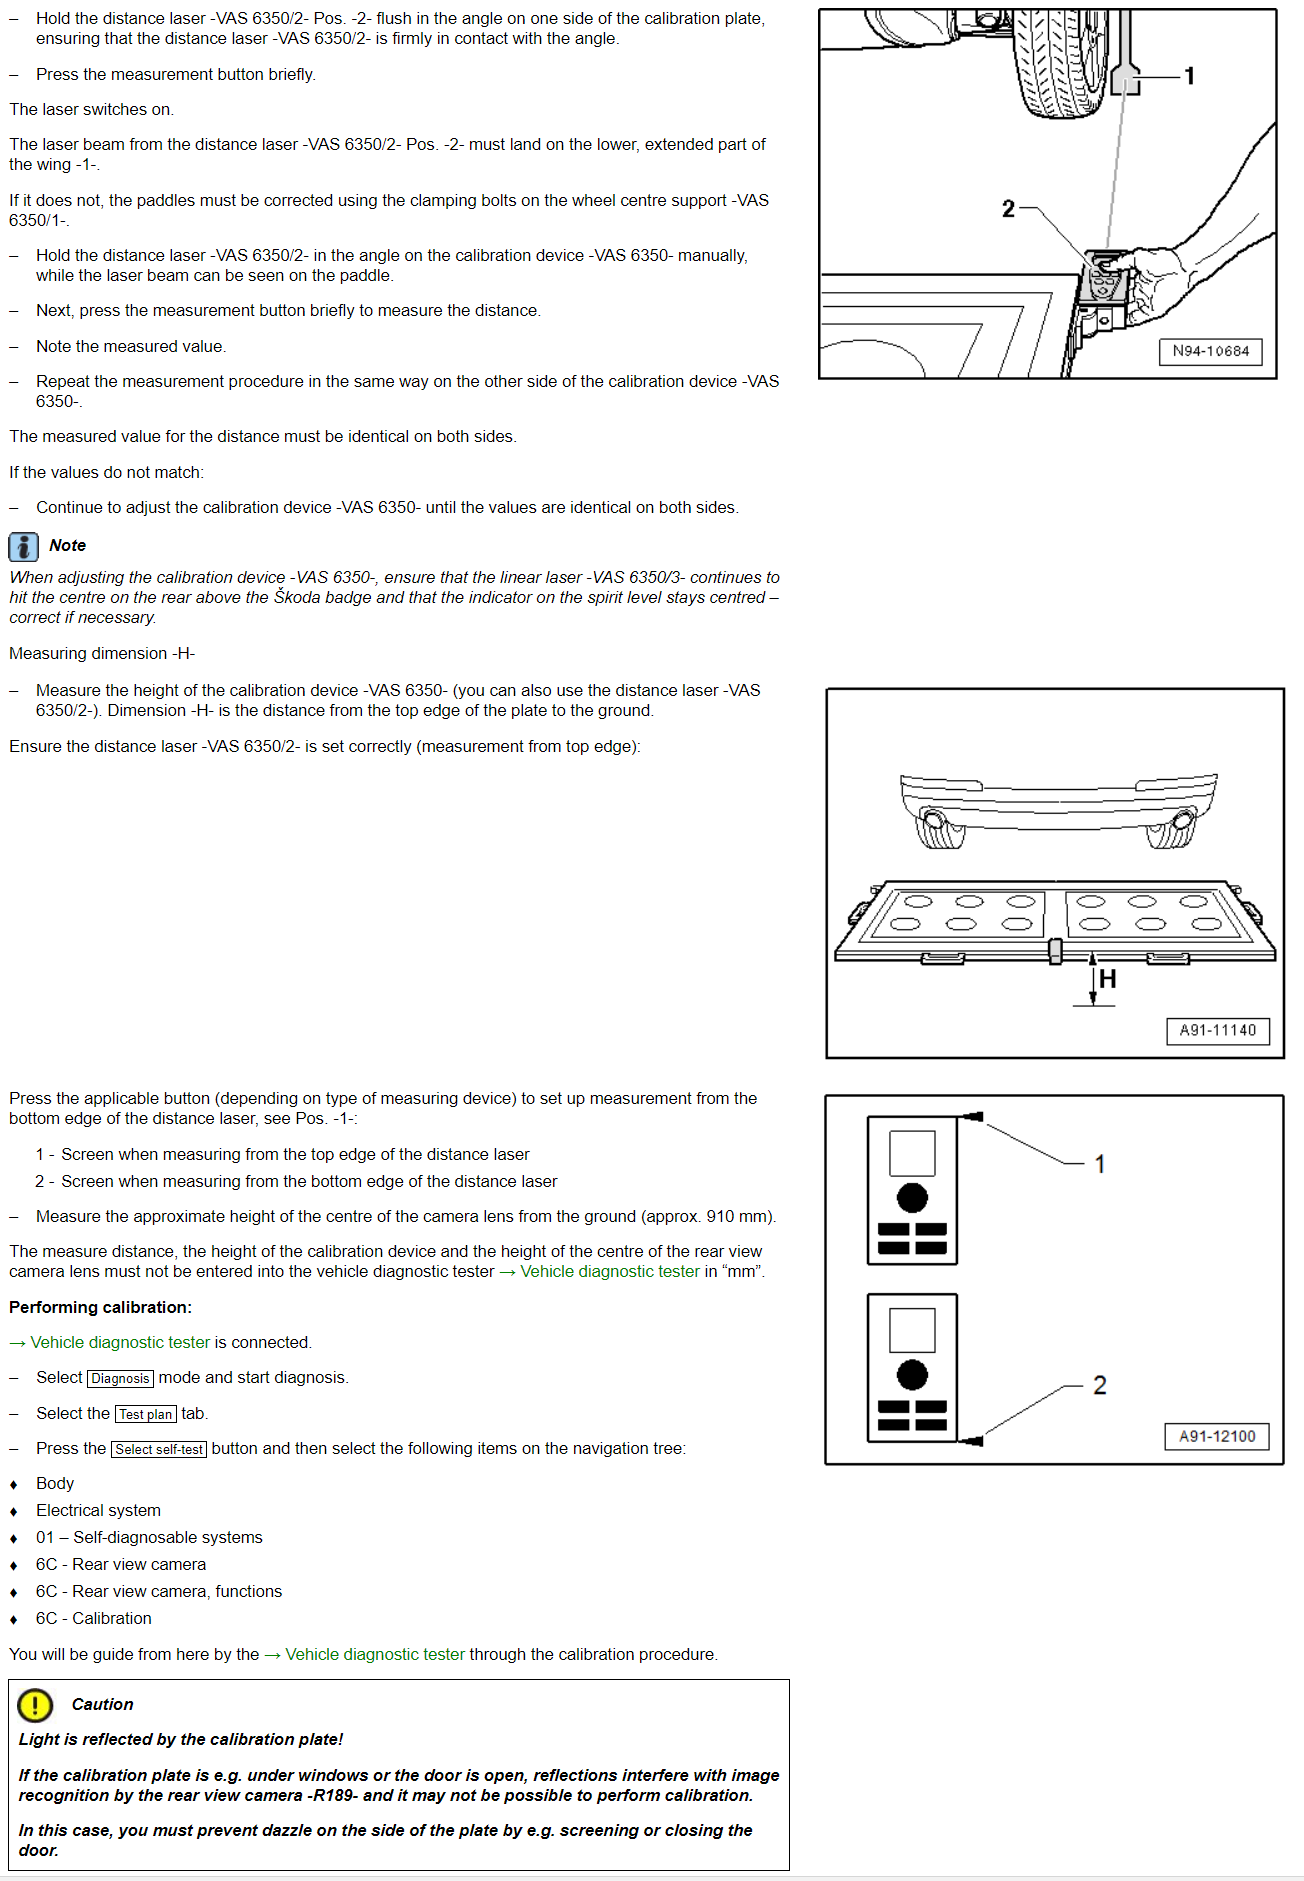 Retro Fit Reversing Camera Skoda Superb Mk Iii Briskoda Wiring Diagram Page 2 Calibration4